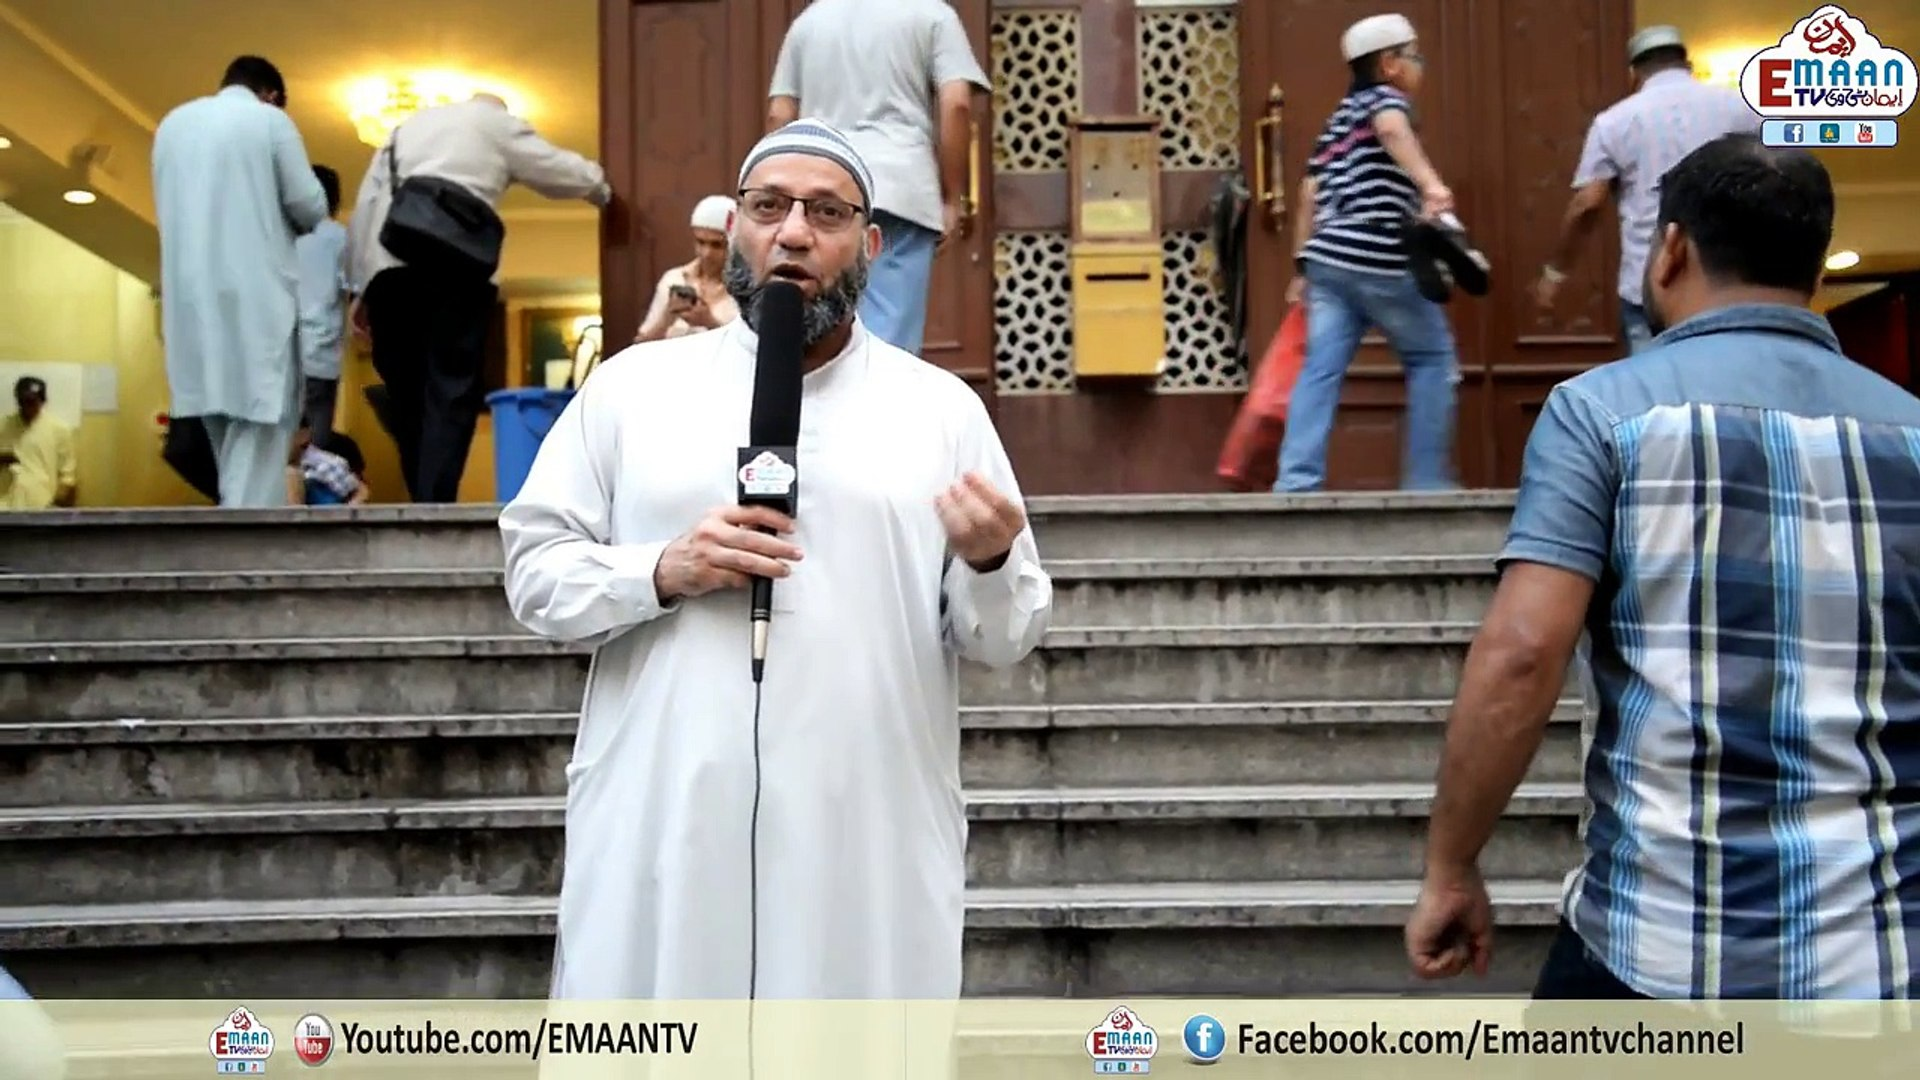 Documentary Of Ramadan And Eid Message Kowloon Masjid Hong Kong 1438, 2017